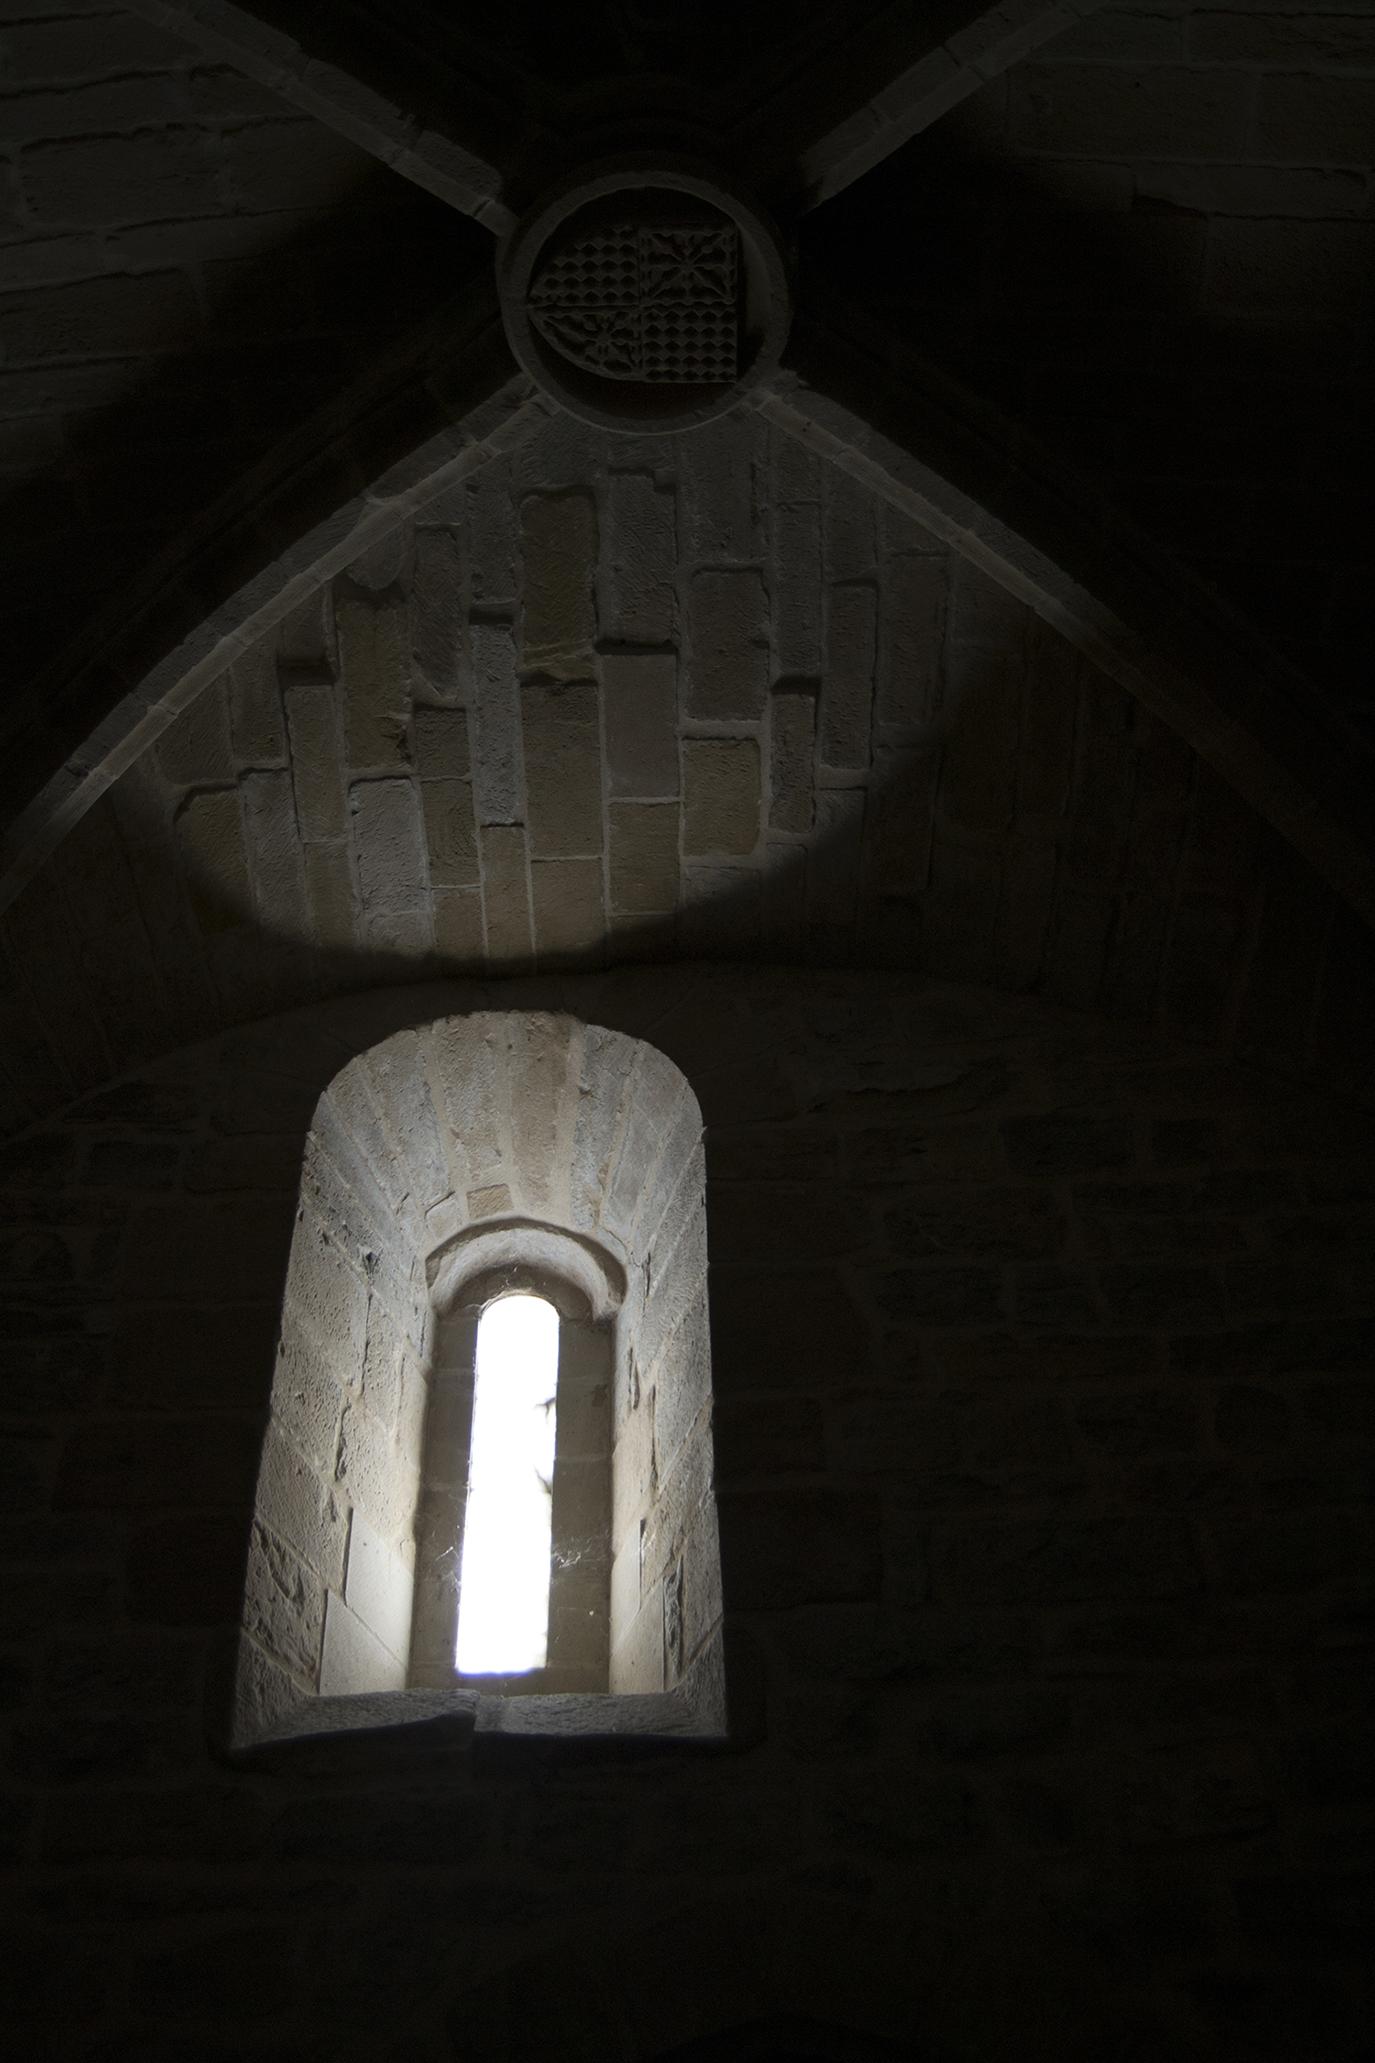 02_Romanesque Window_reflection above.jpg